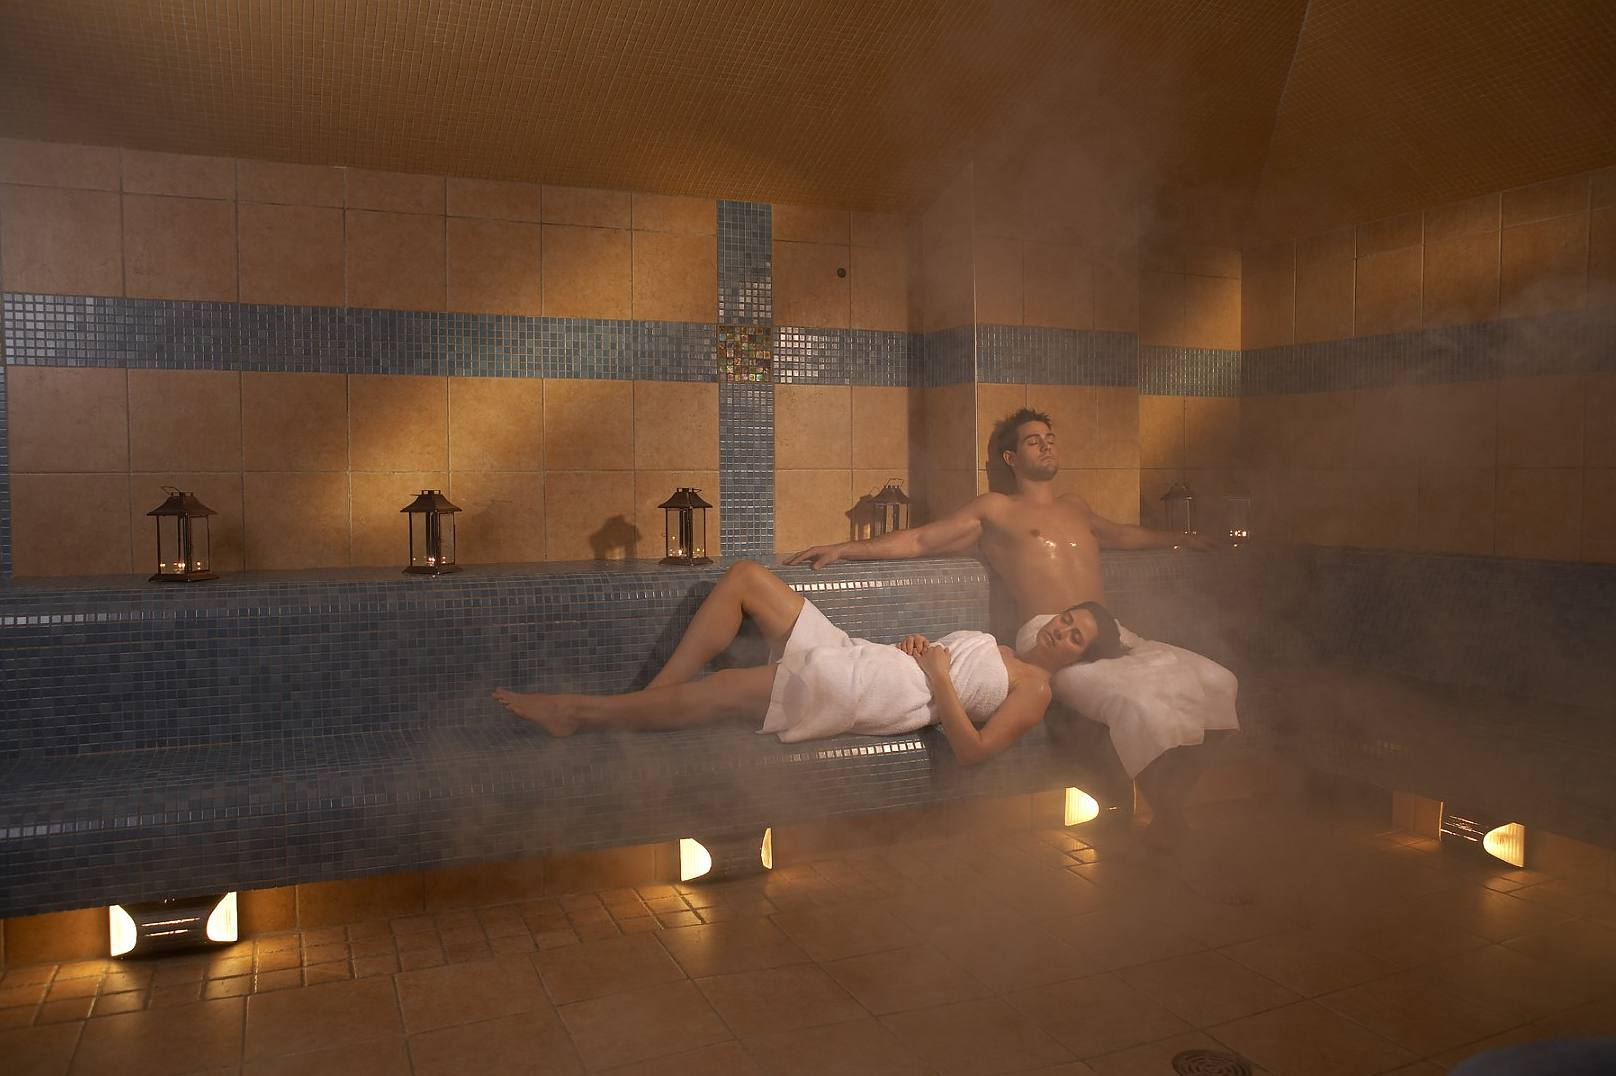 Couple enjoying the Hammam steam room at Rainspa